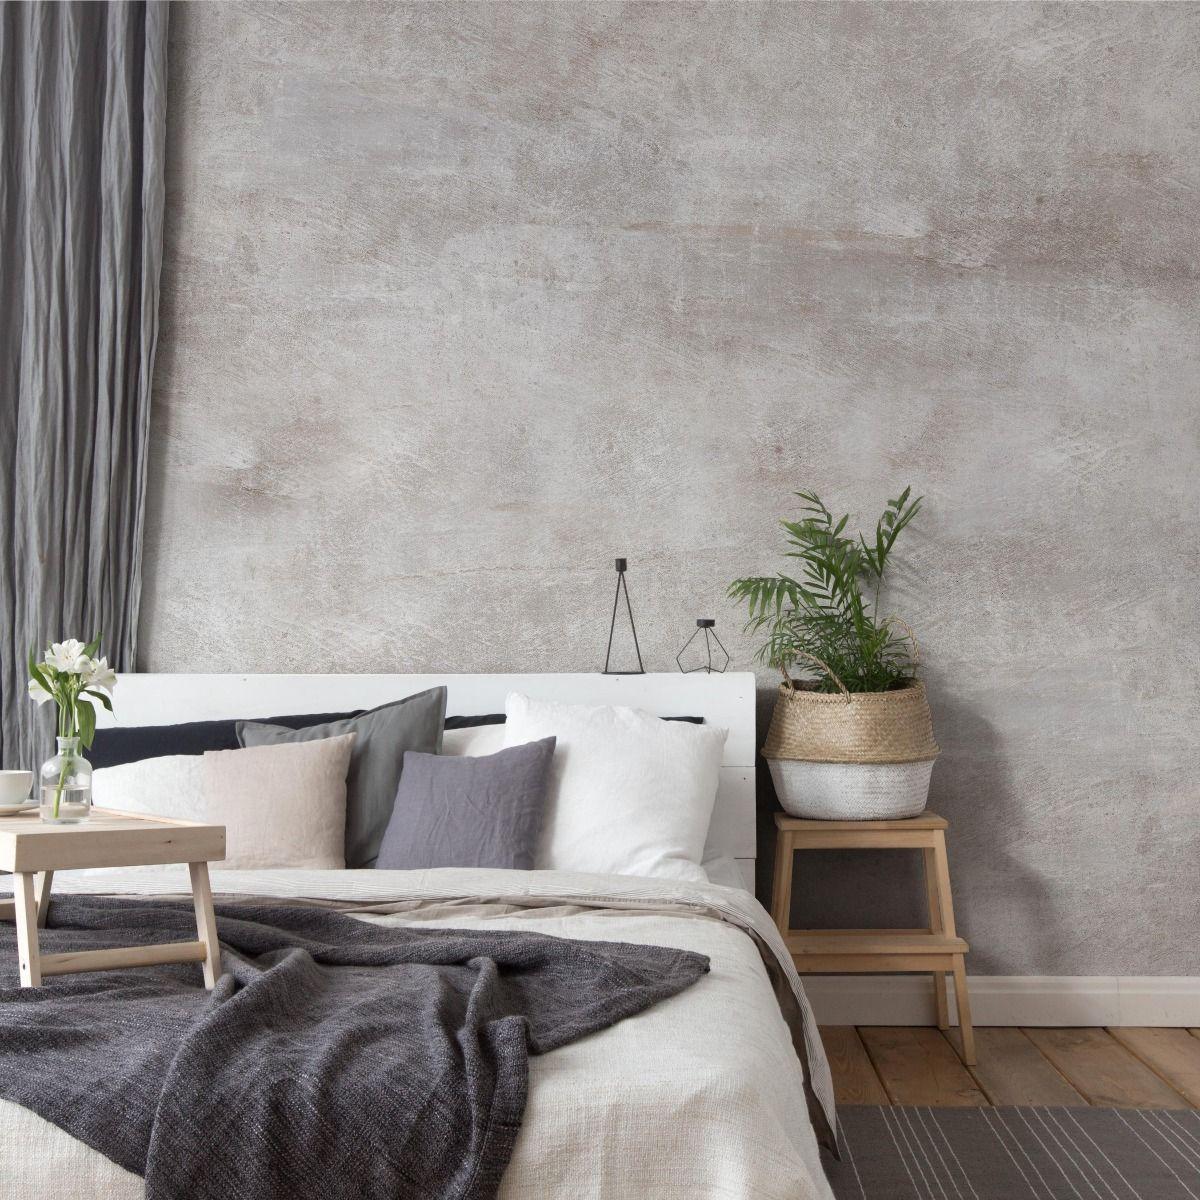 Kushner 6 56 L X 24 W Metallic Peel And Stick Wallpaper Roll Peel And Stick Wallpaper Wallpaper Roll Metallic Wallpaper